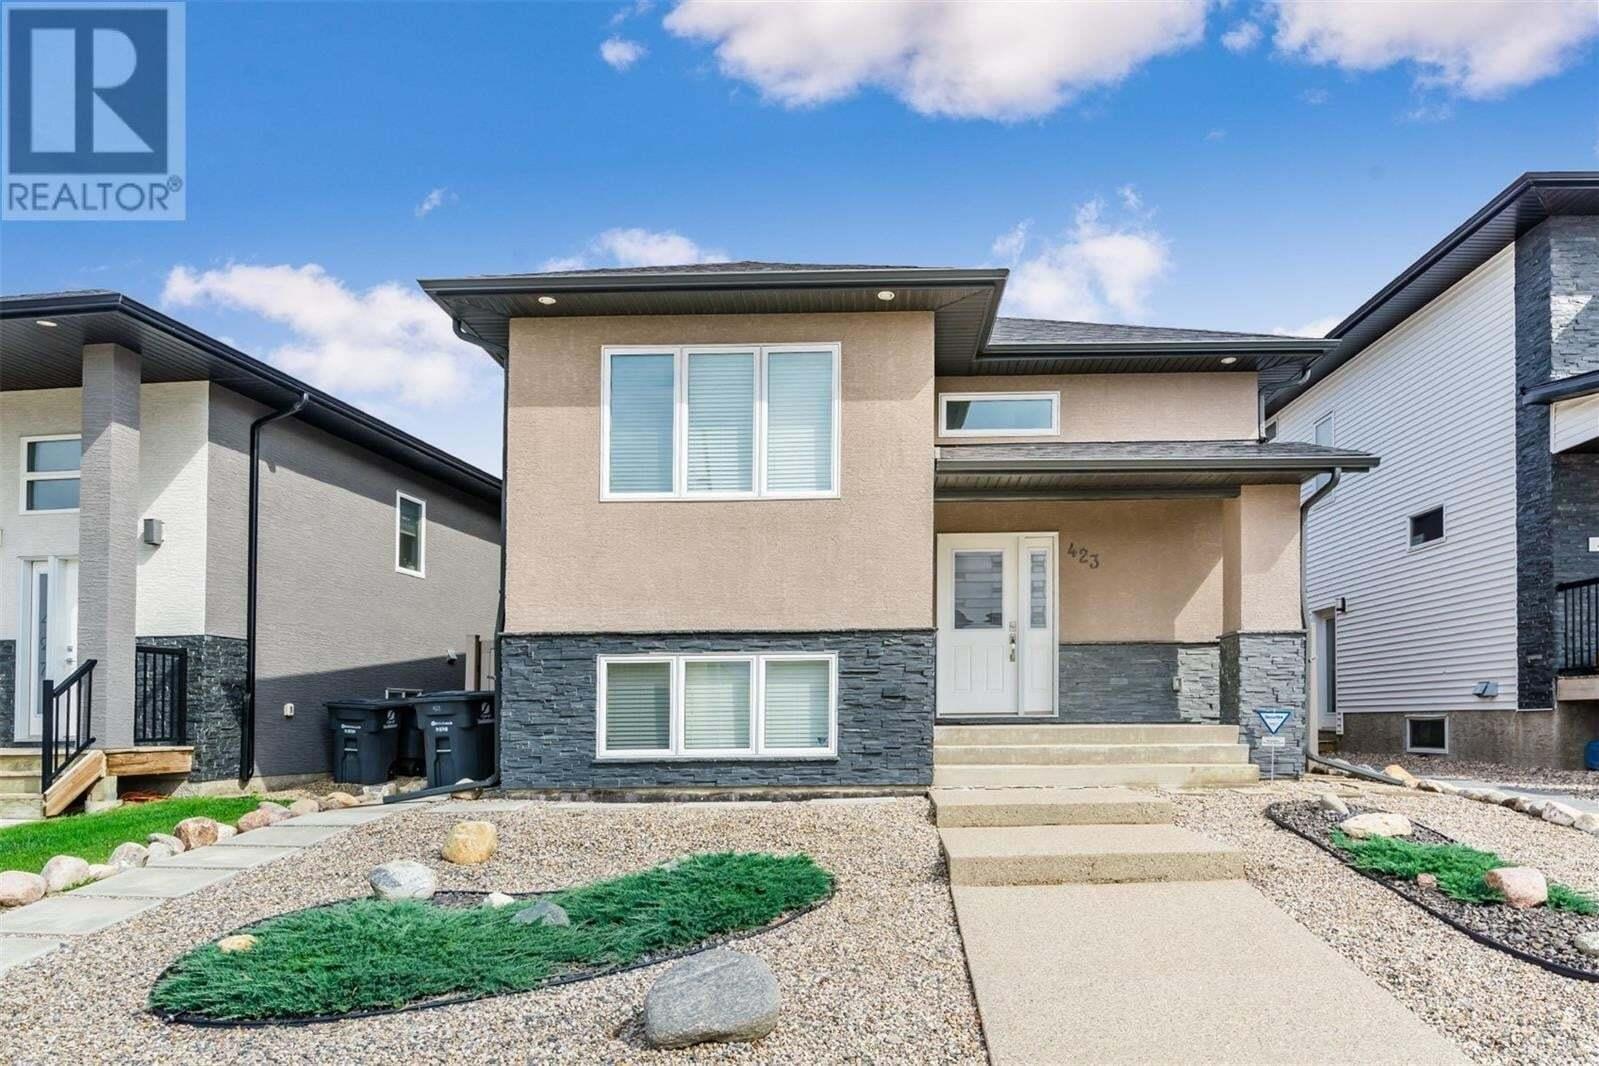 House for sale at 423 Evergreen Blvd Saskatoon Saskatchewan - MLS: SK811586